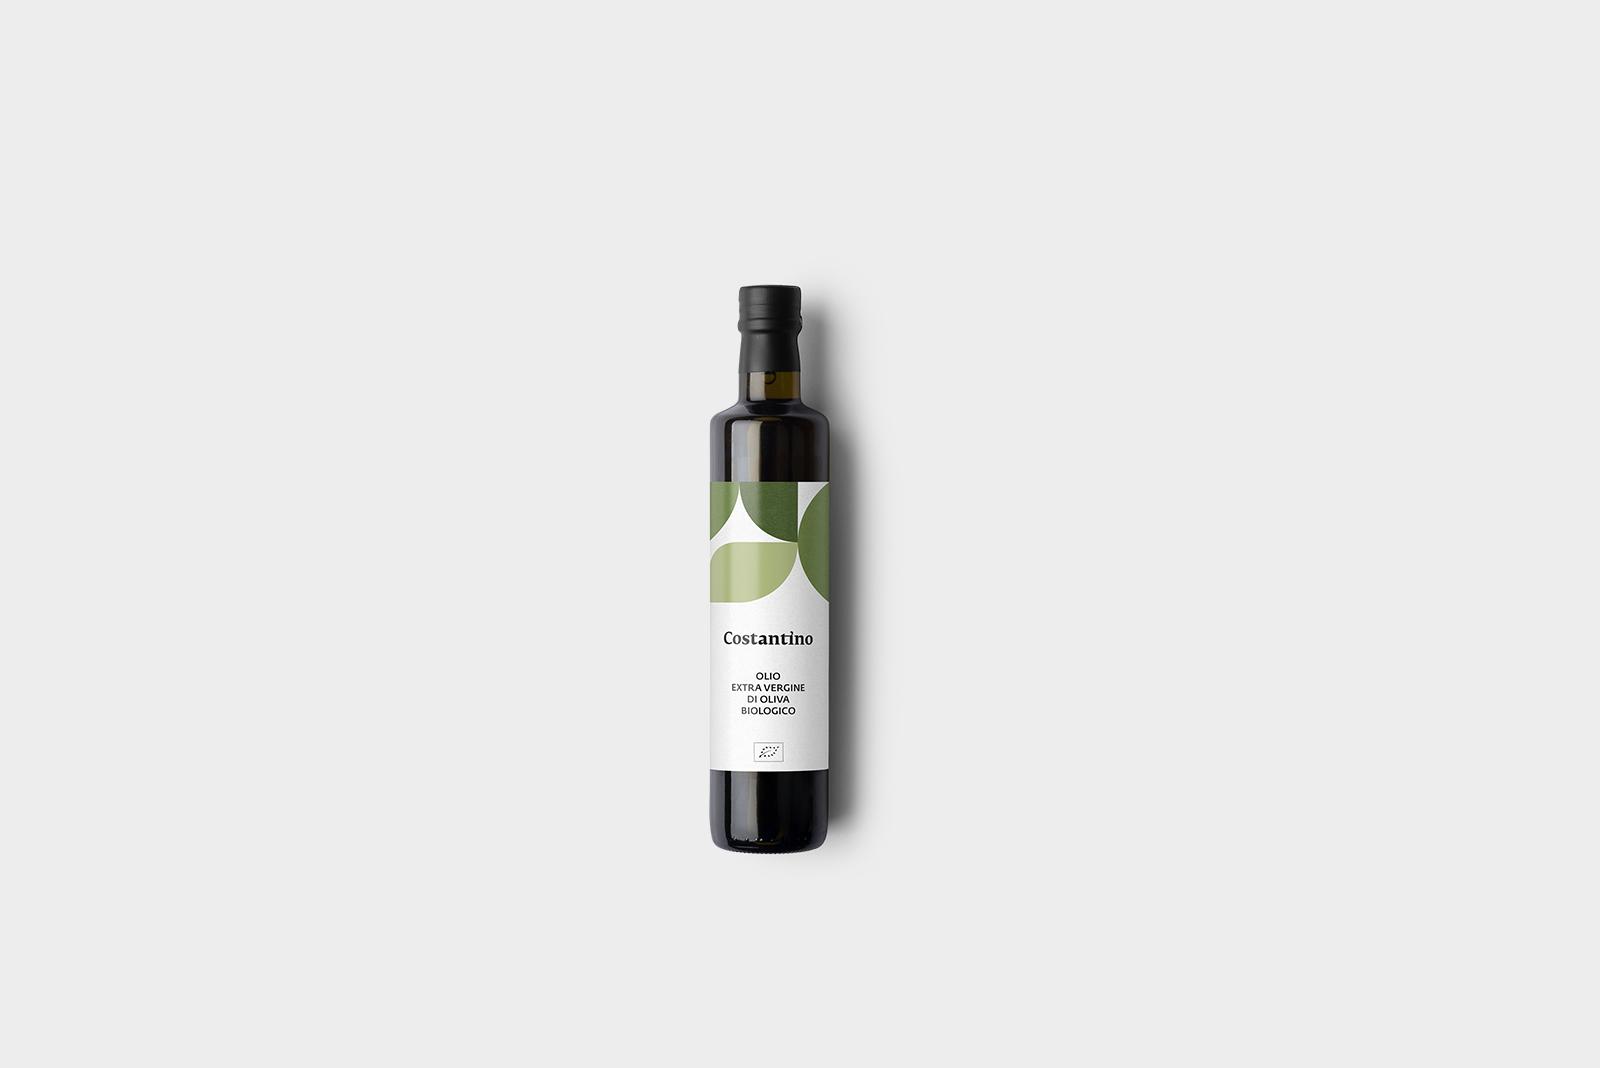 Costantino - Olio Extra Vergine d'Oliva Biologico - bottiglia 10cl